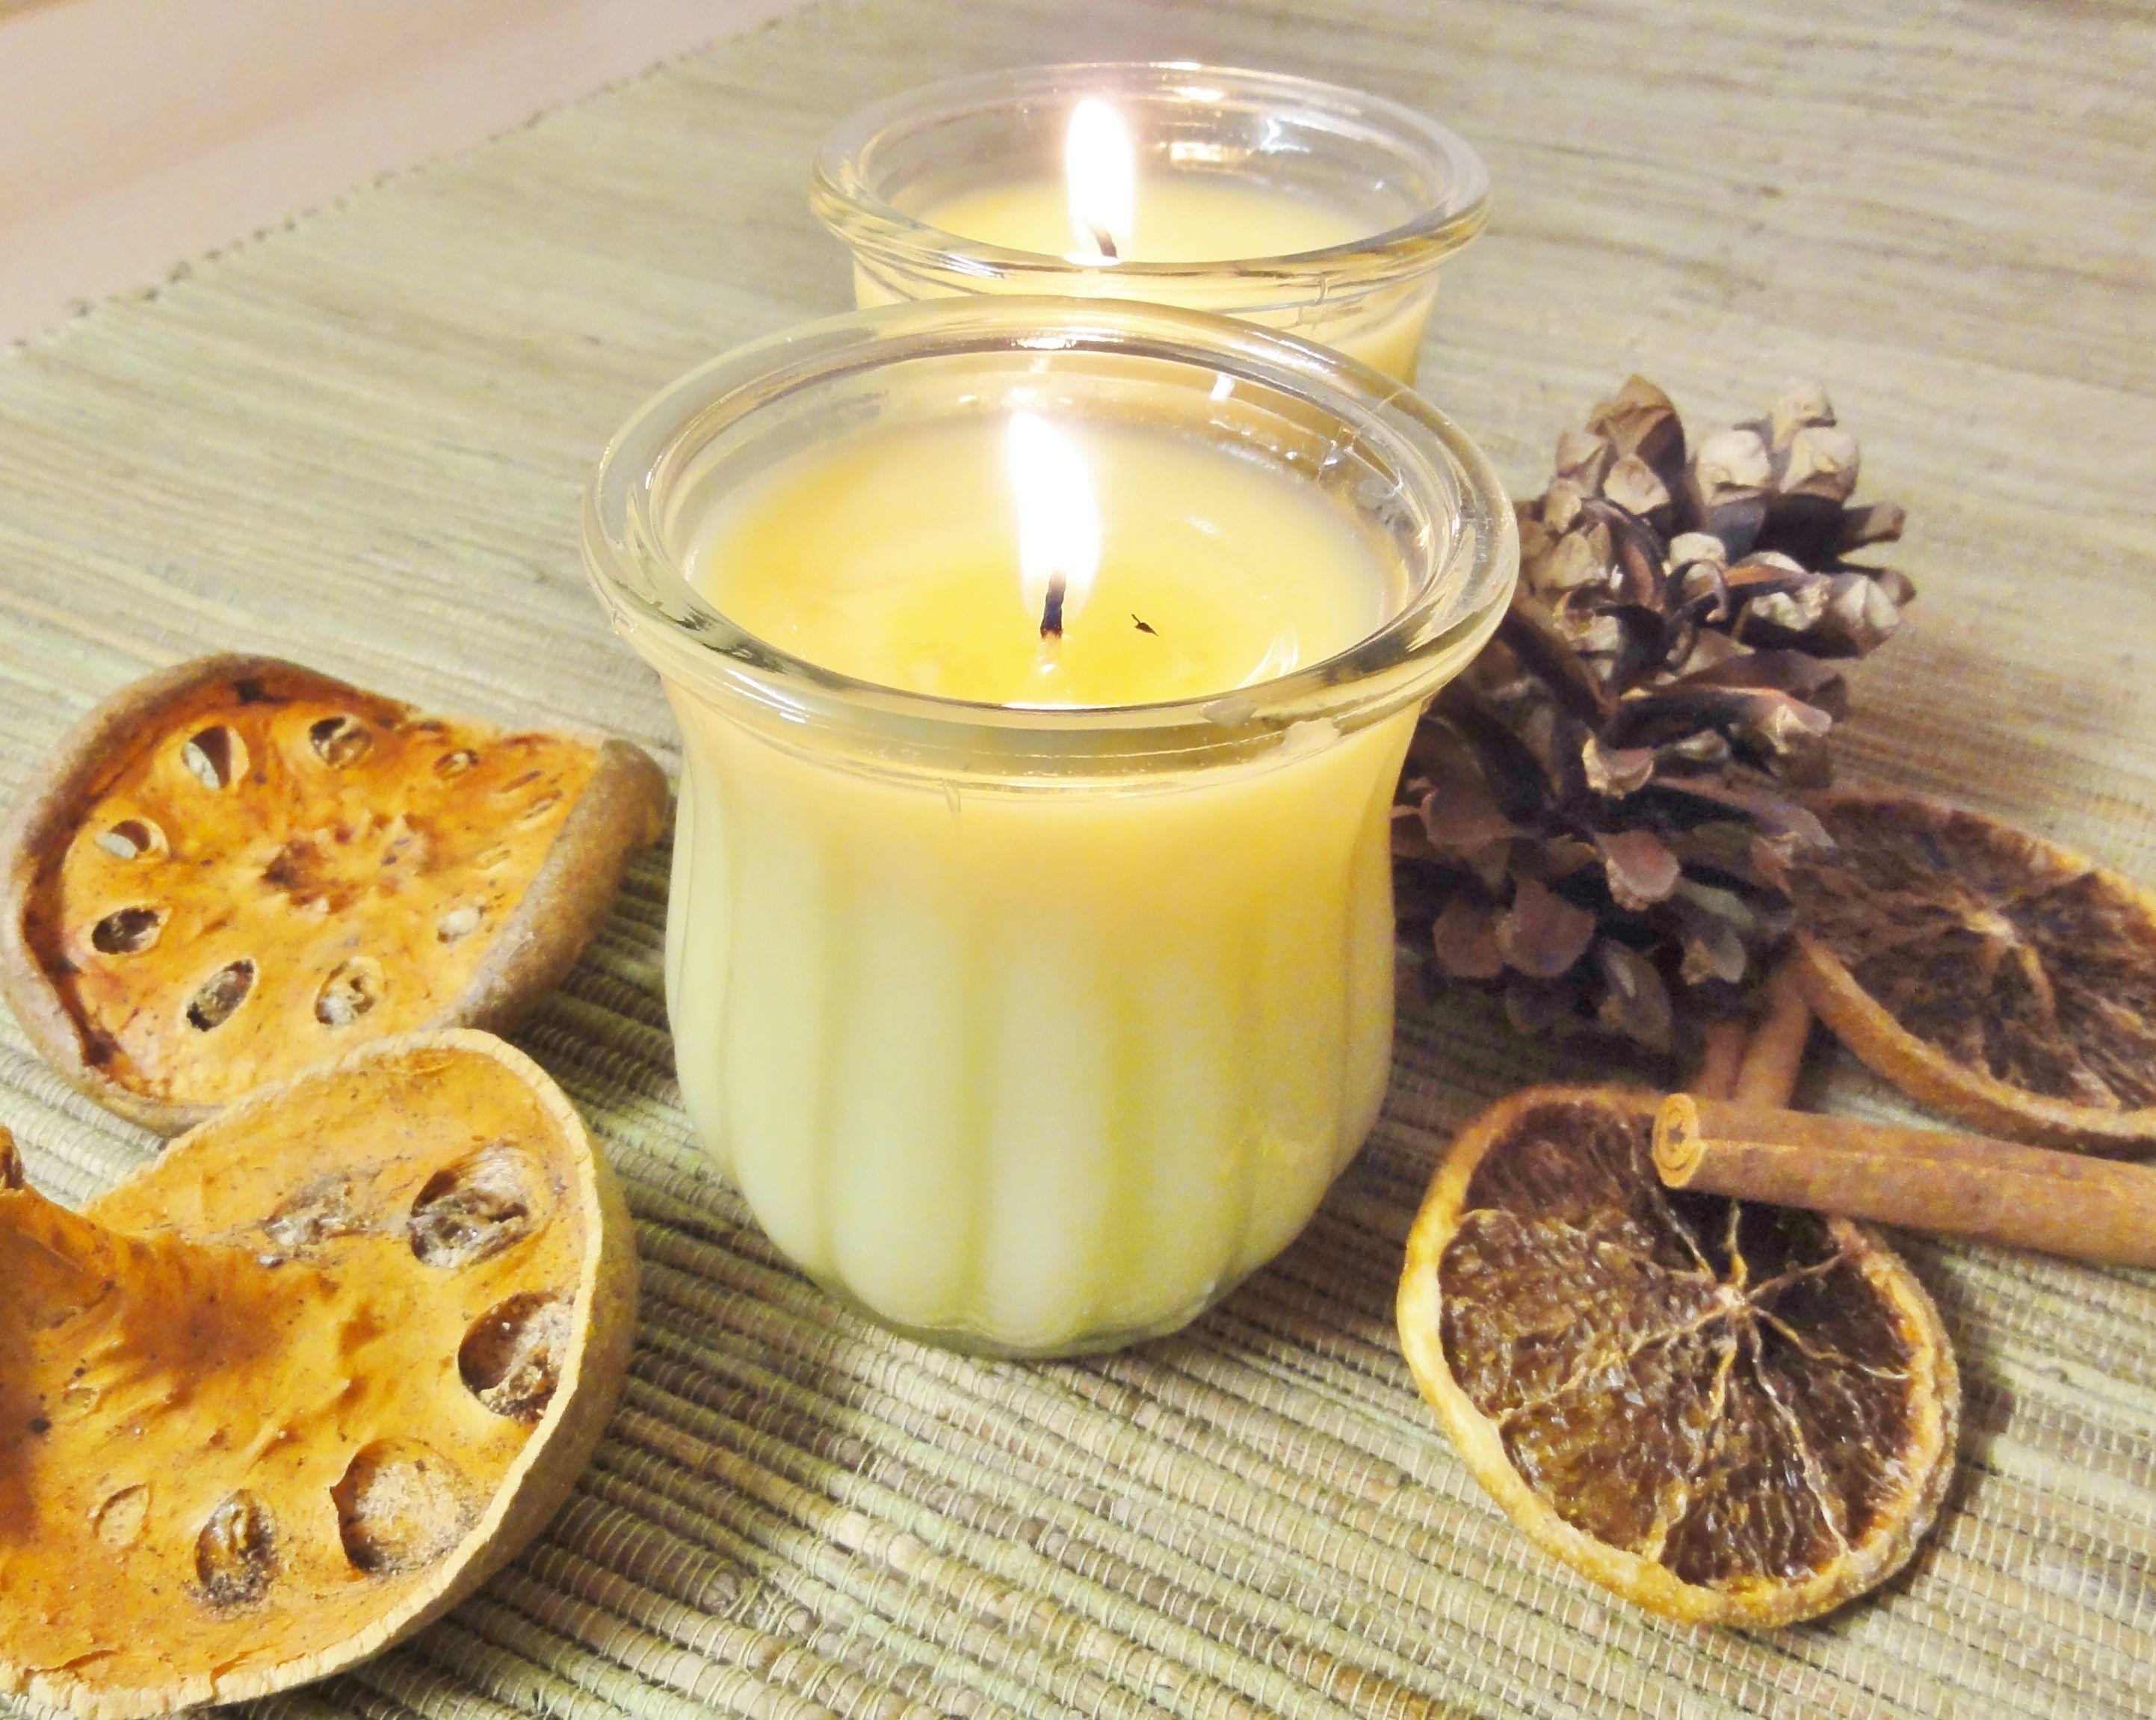 massagekerze selber machen diy kosmetik co kerzen kosmetik und selber machen. Black Bedroom Furniture Sets. Home Design Ideas